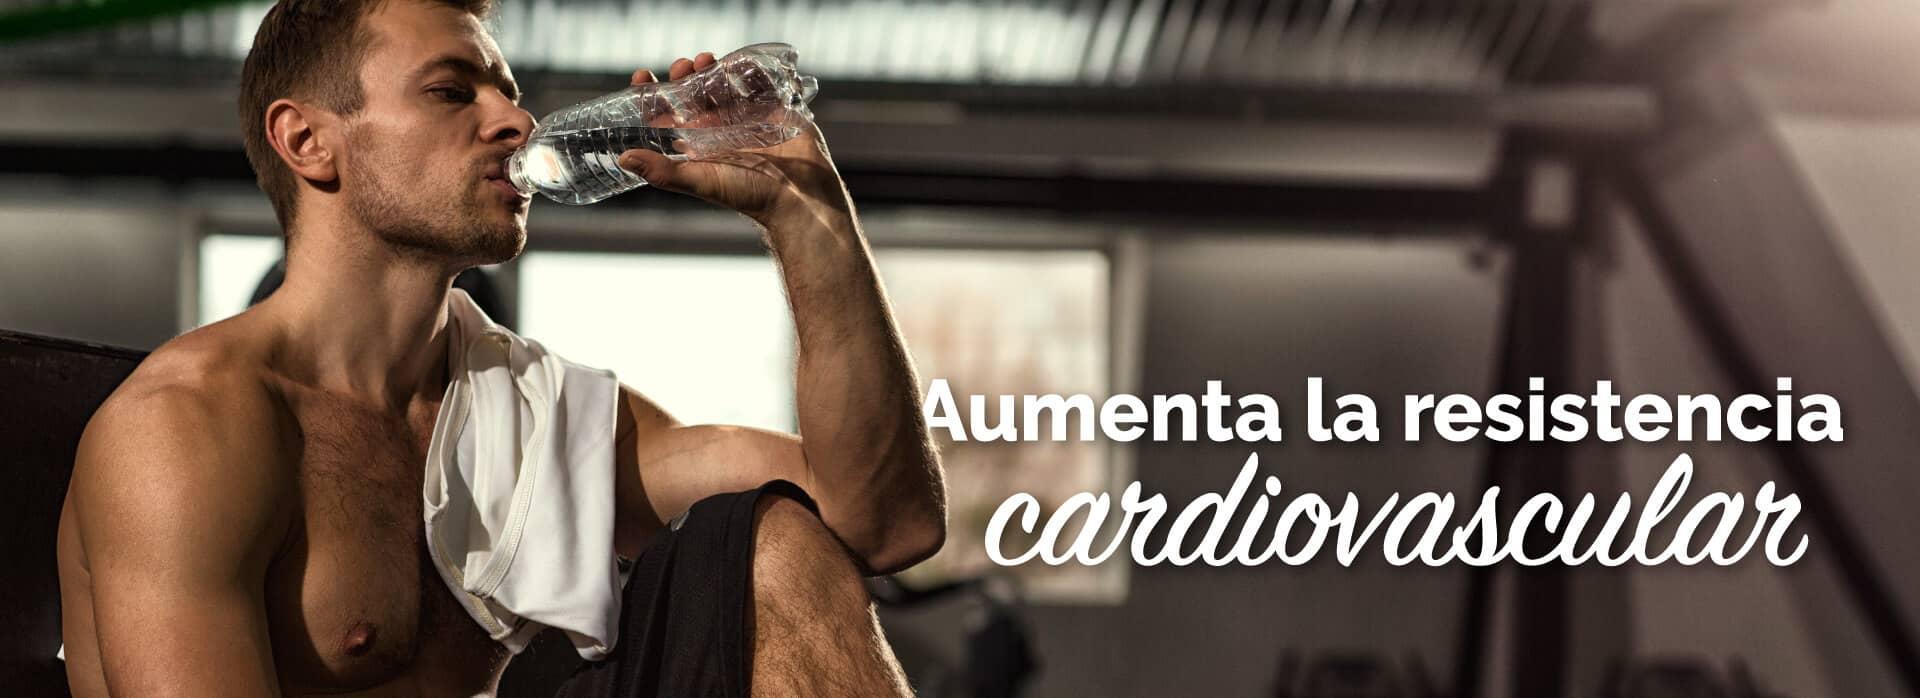 Aumenta la resistencia cardiovascular